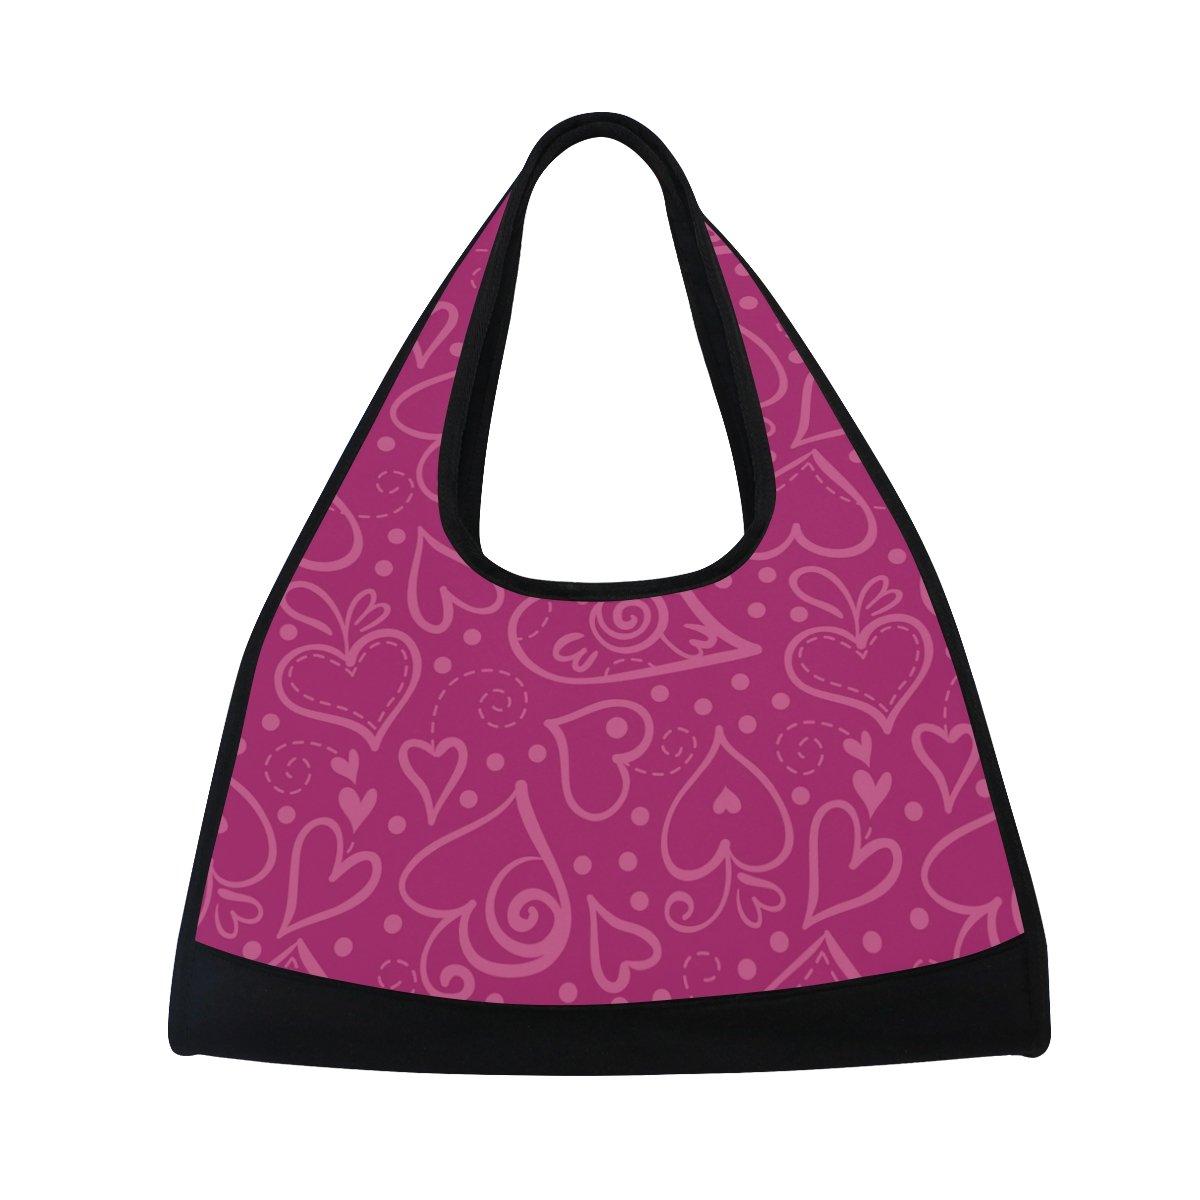 AHOMY Sports Gym Bag Purple Love Heart Duffel Bag Travel Shoulder Bag